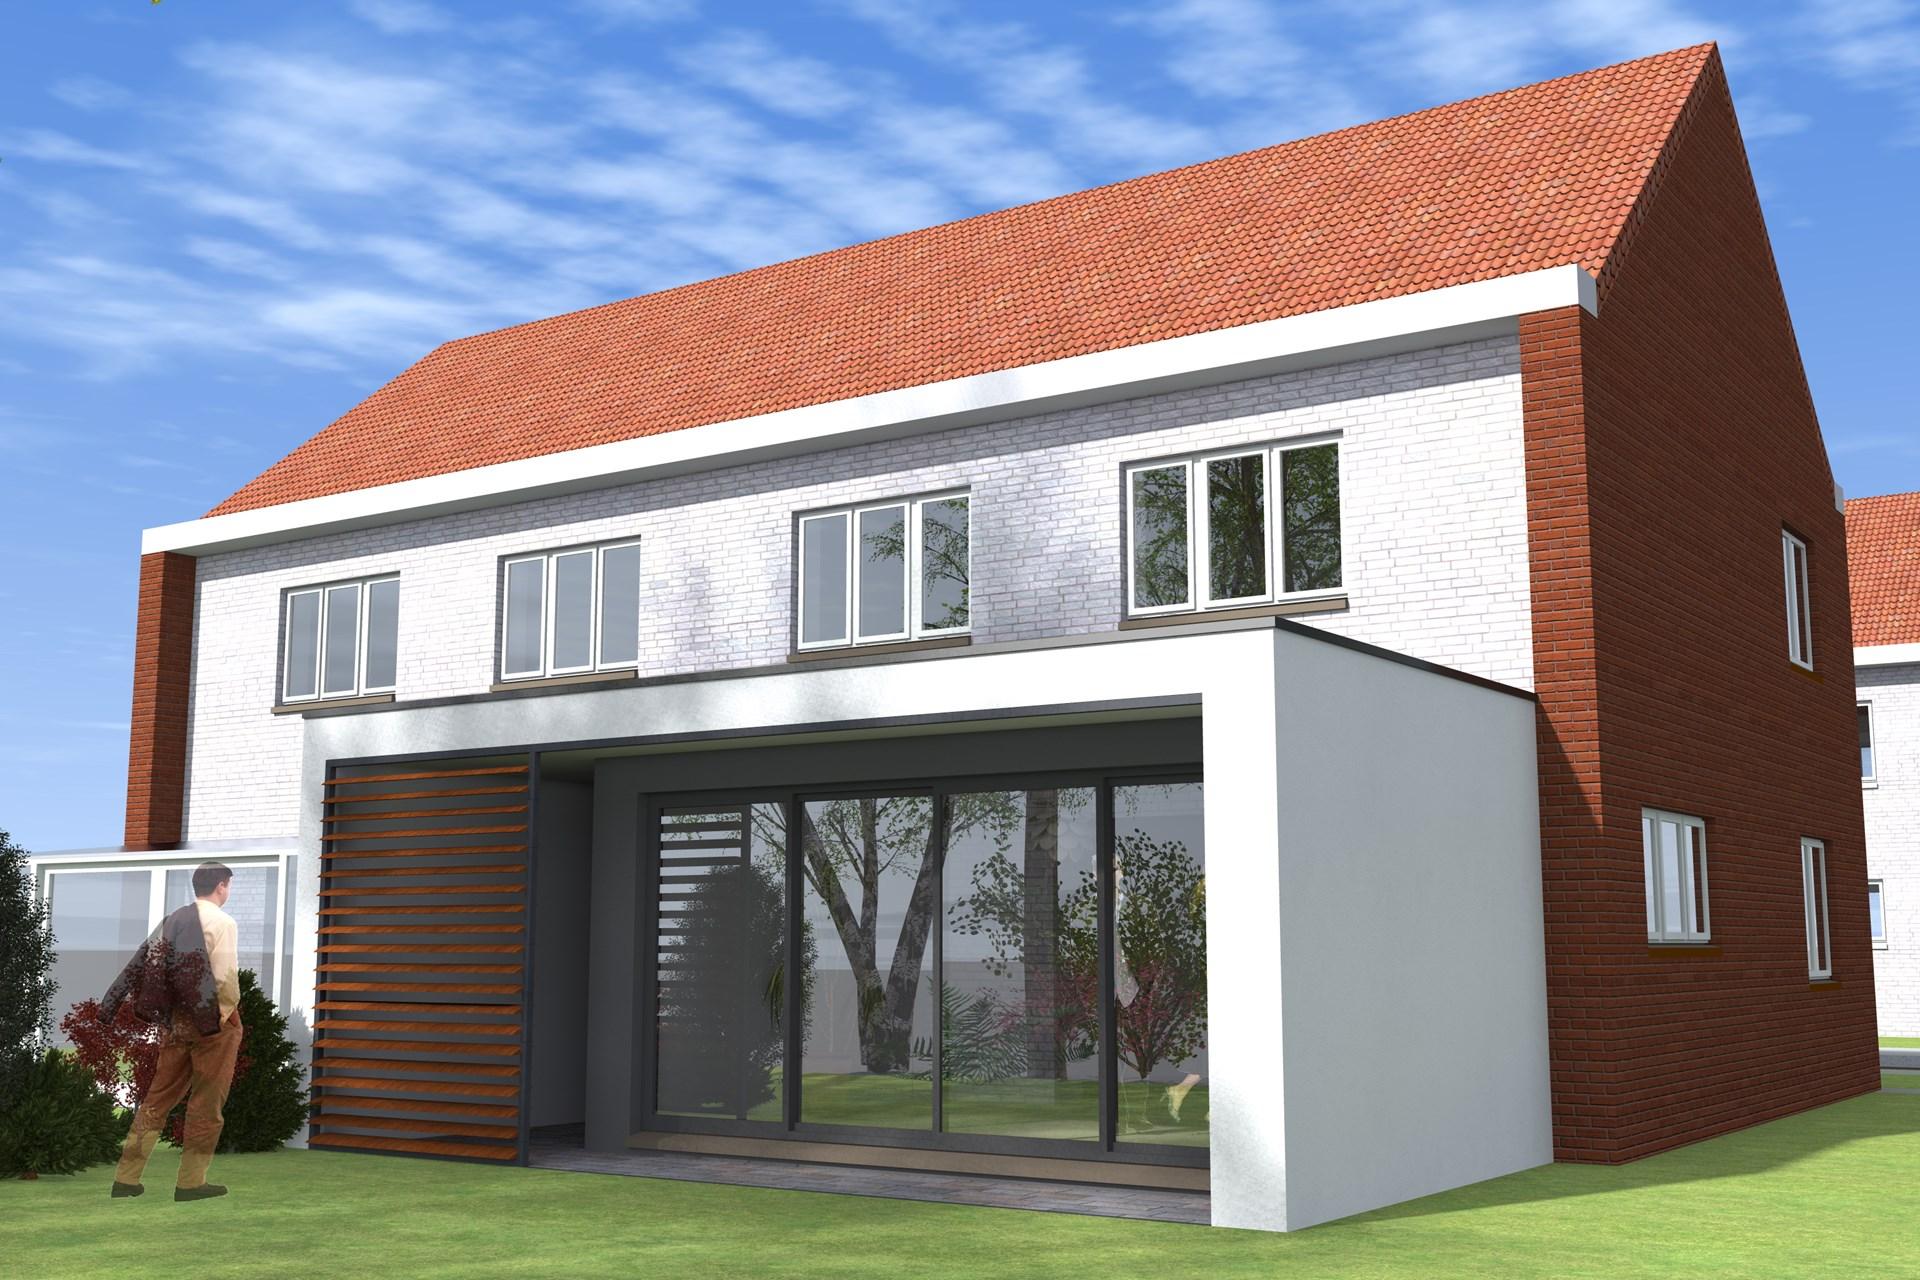 architecte agrandissement extension transformation maison. Black Bedroom Furniture Sets. Home Design Ideas